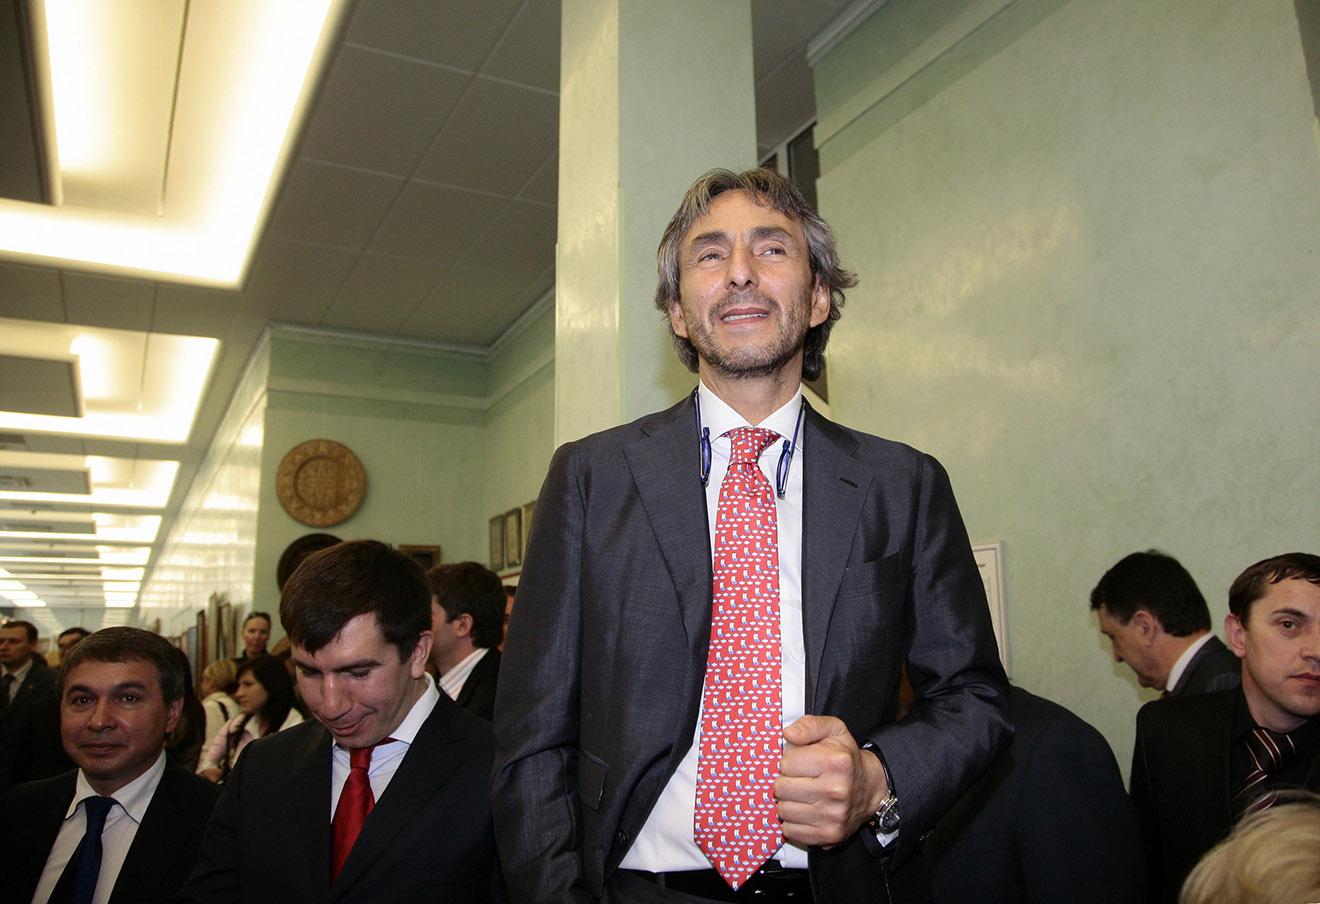 Умар Джабраилов, 2009 год.